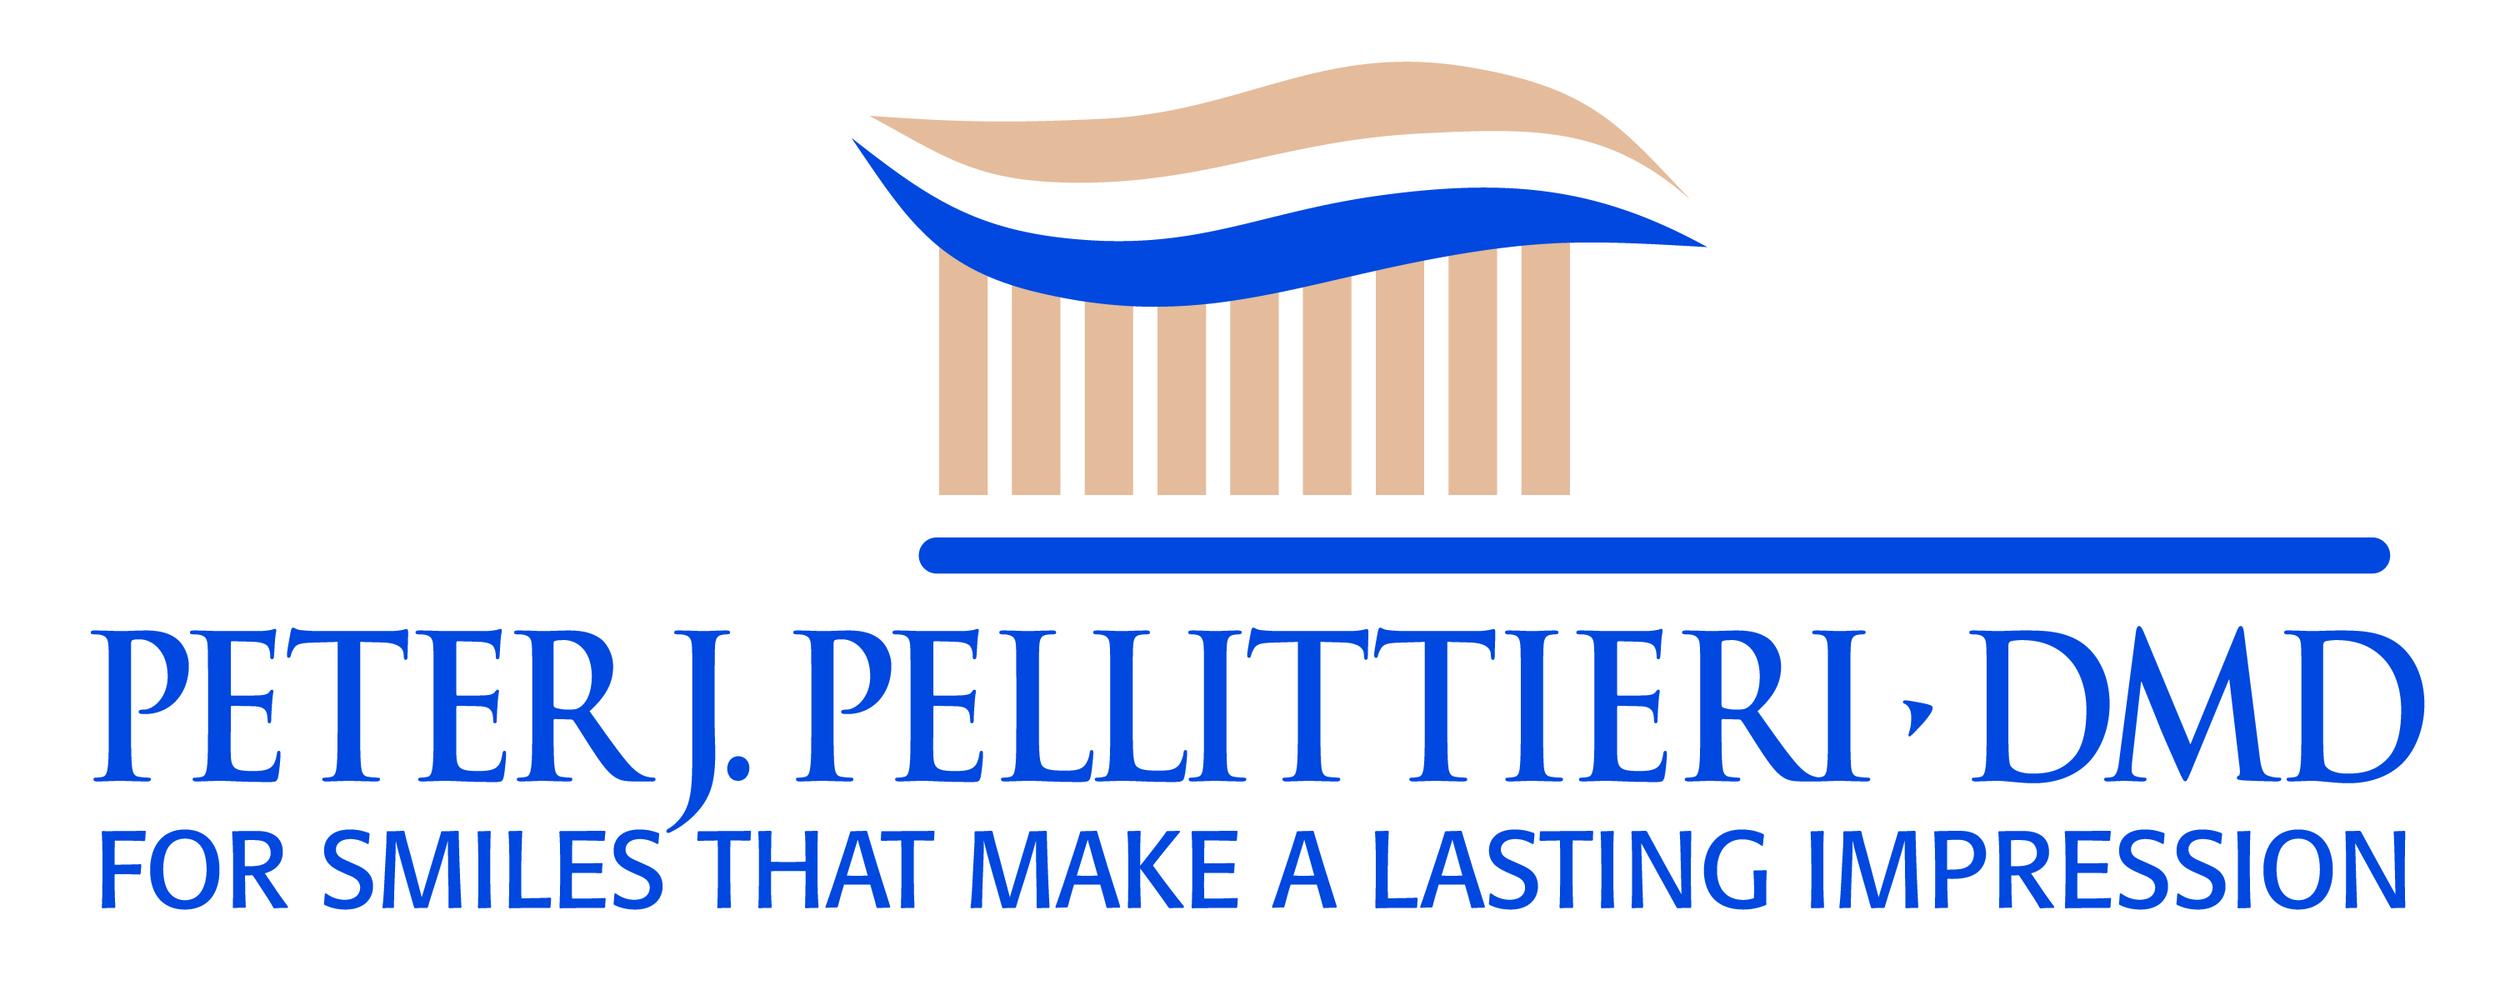 Peter J. Pellittieri DMD